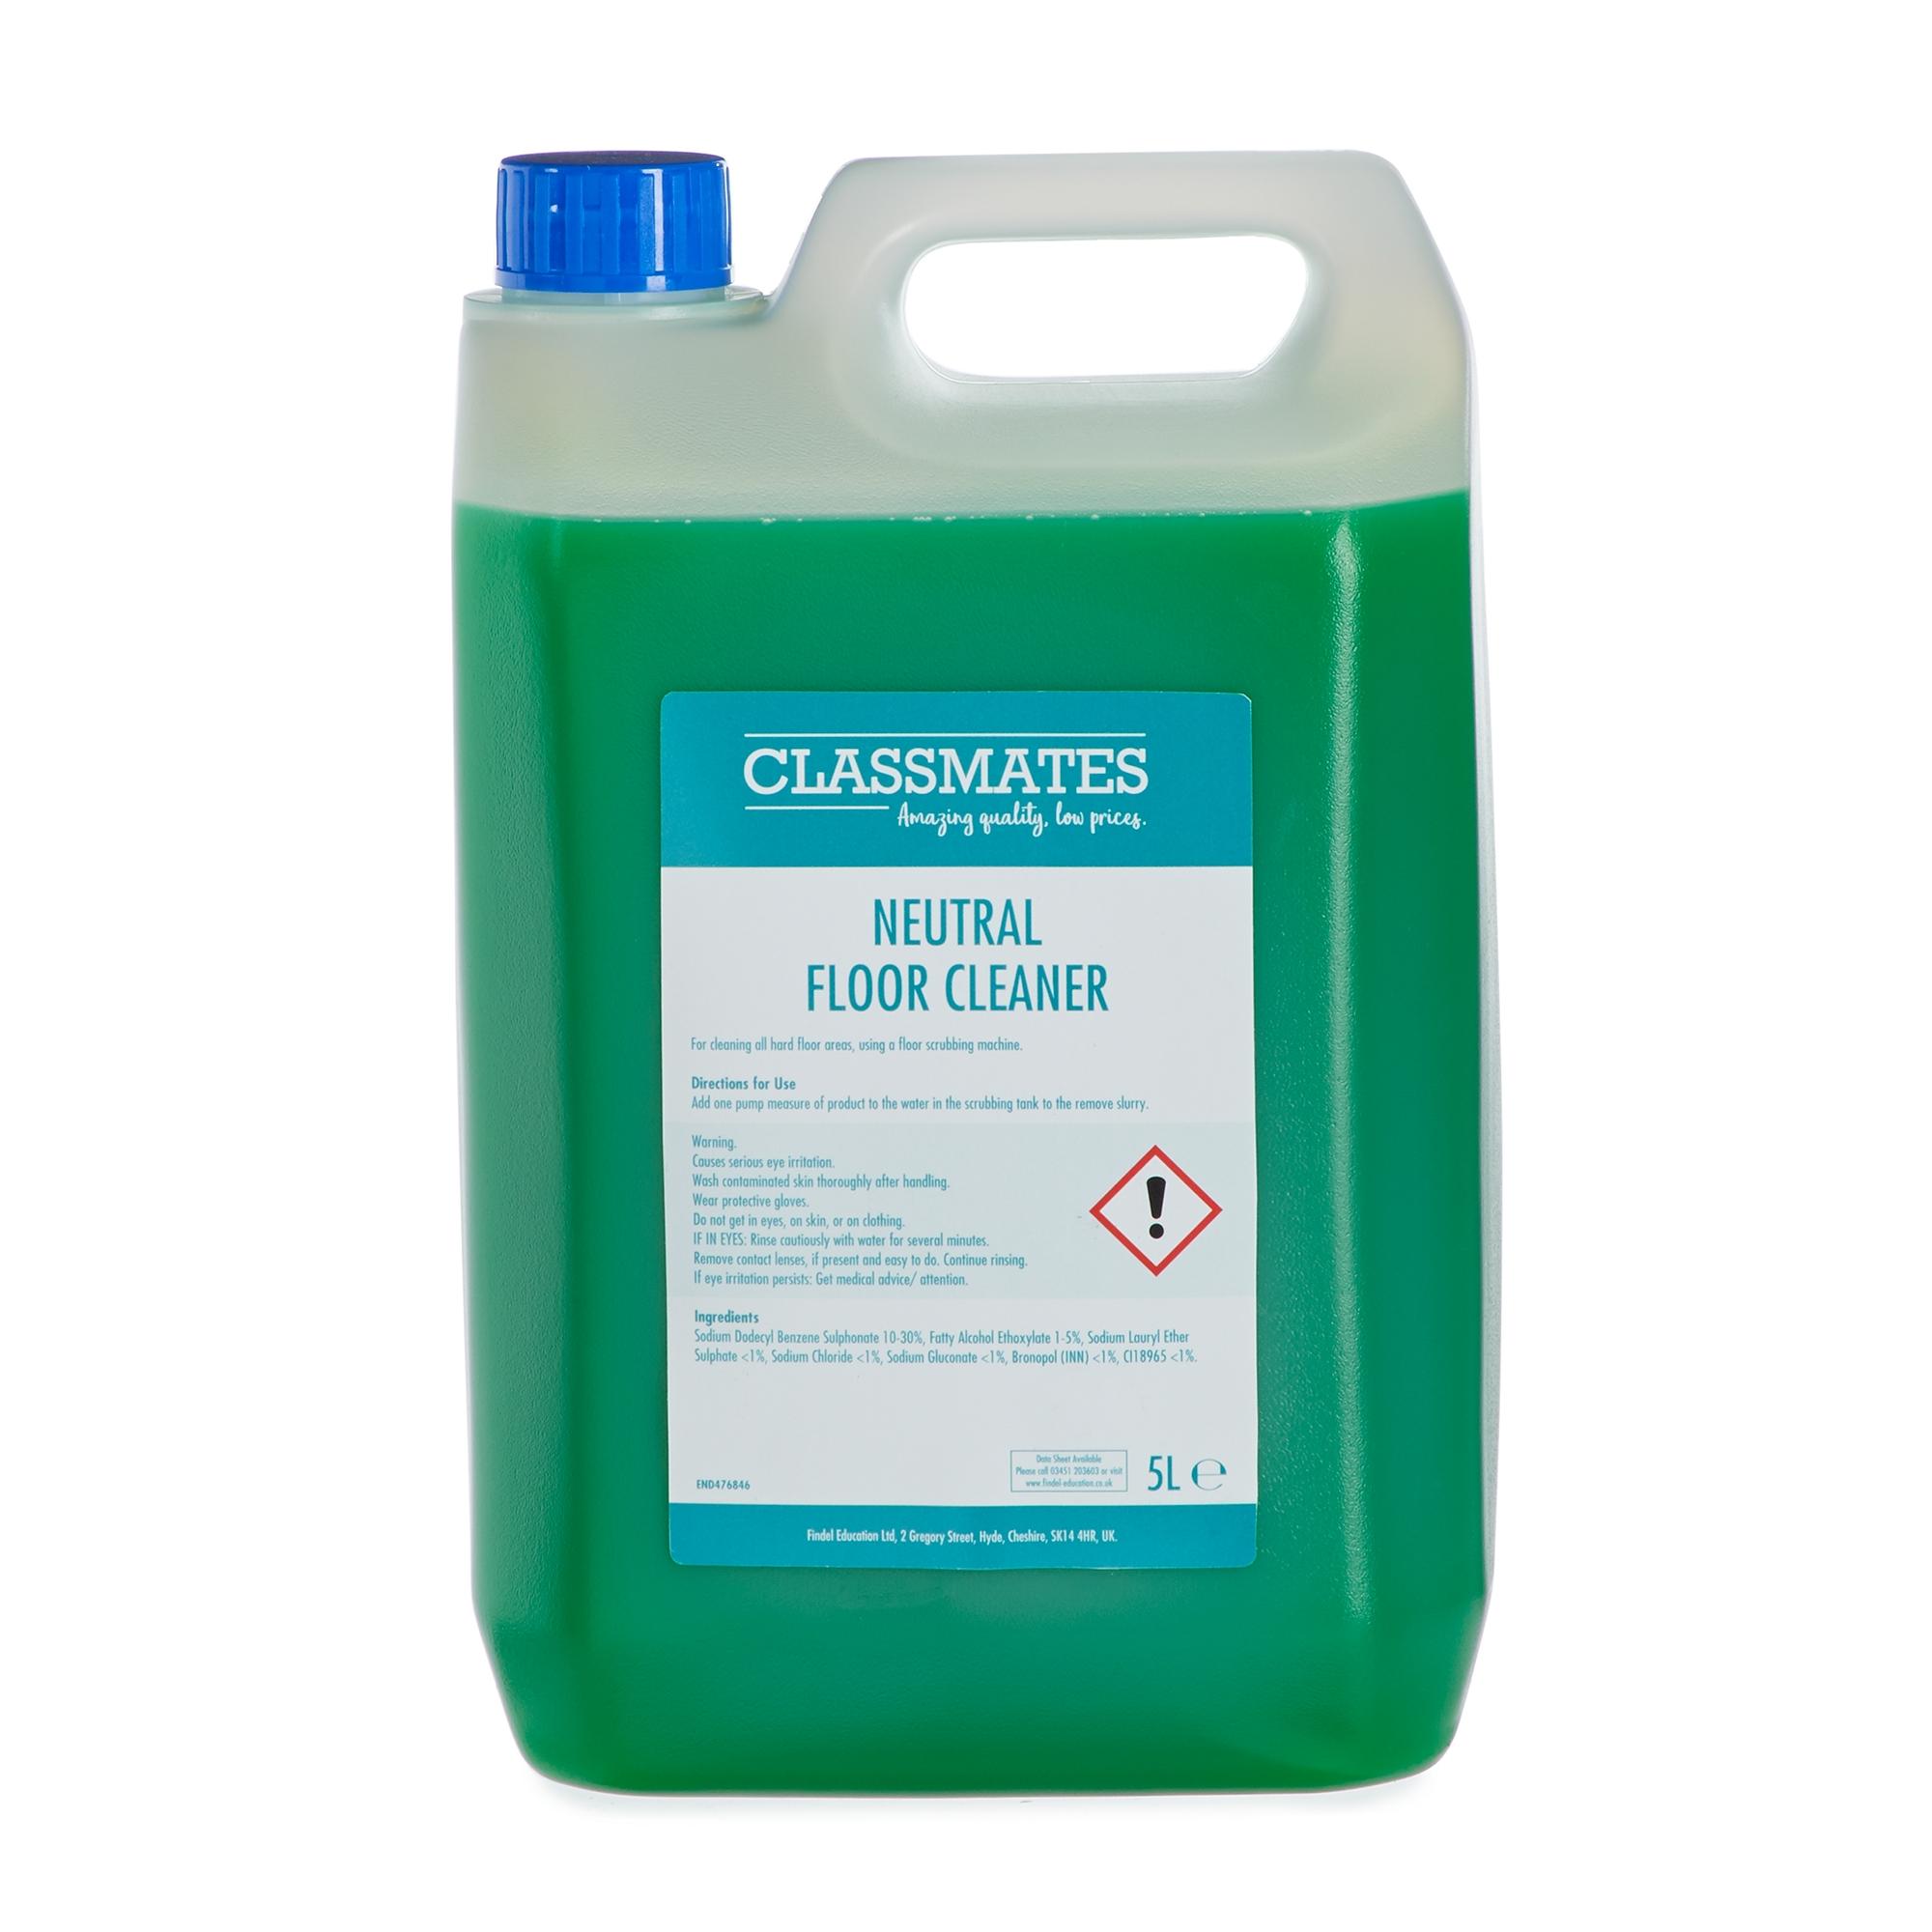 Classmates Neutral Floor Cleaner 5L (Case of 2)